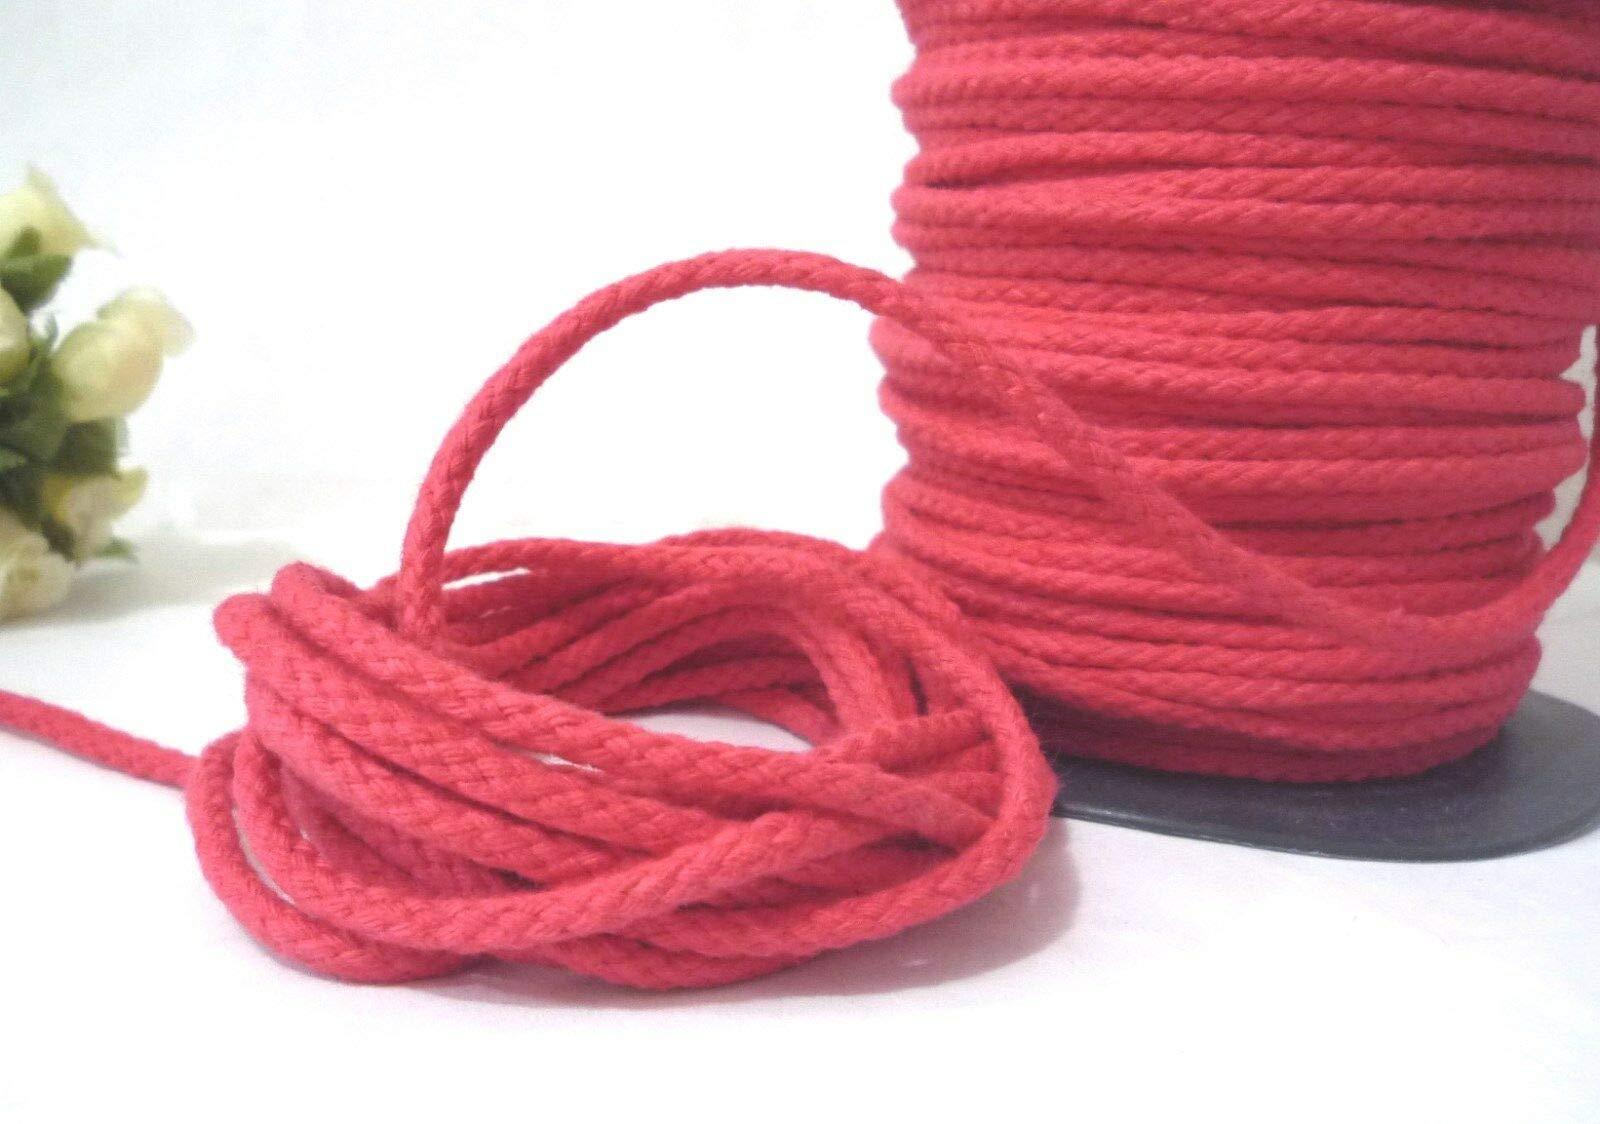 FidgetKute 10yd / 9 Meter Rose Red Braid Cotton Cord String Rope Drawstring 3.5mm CC61 by FidgetKute